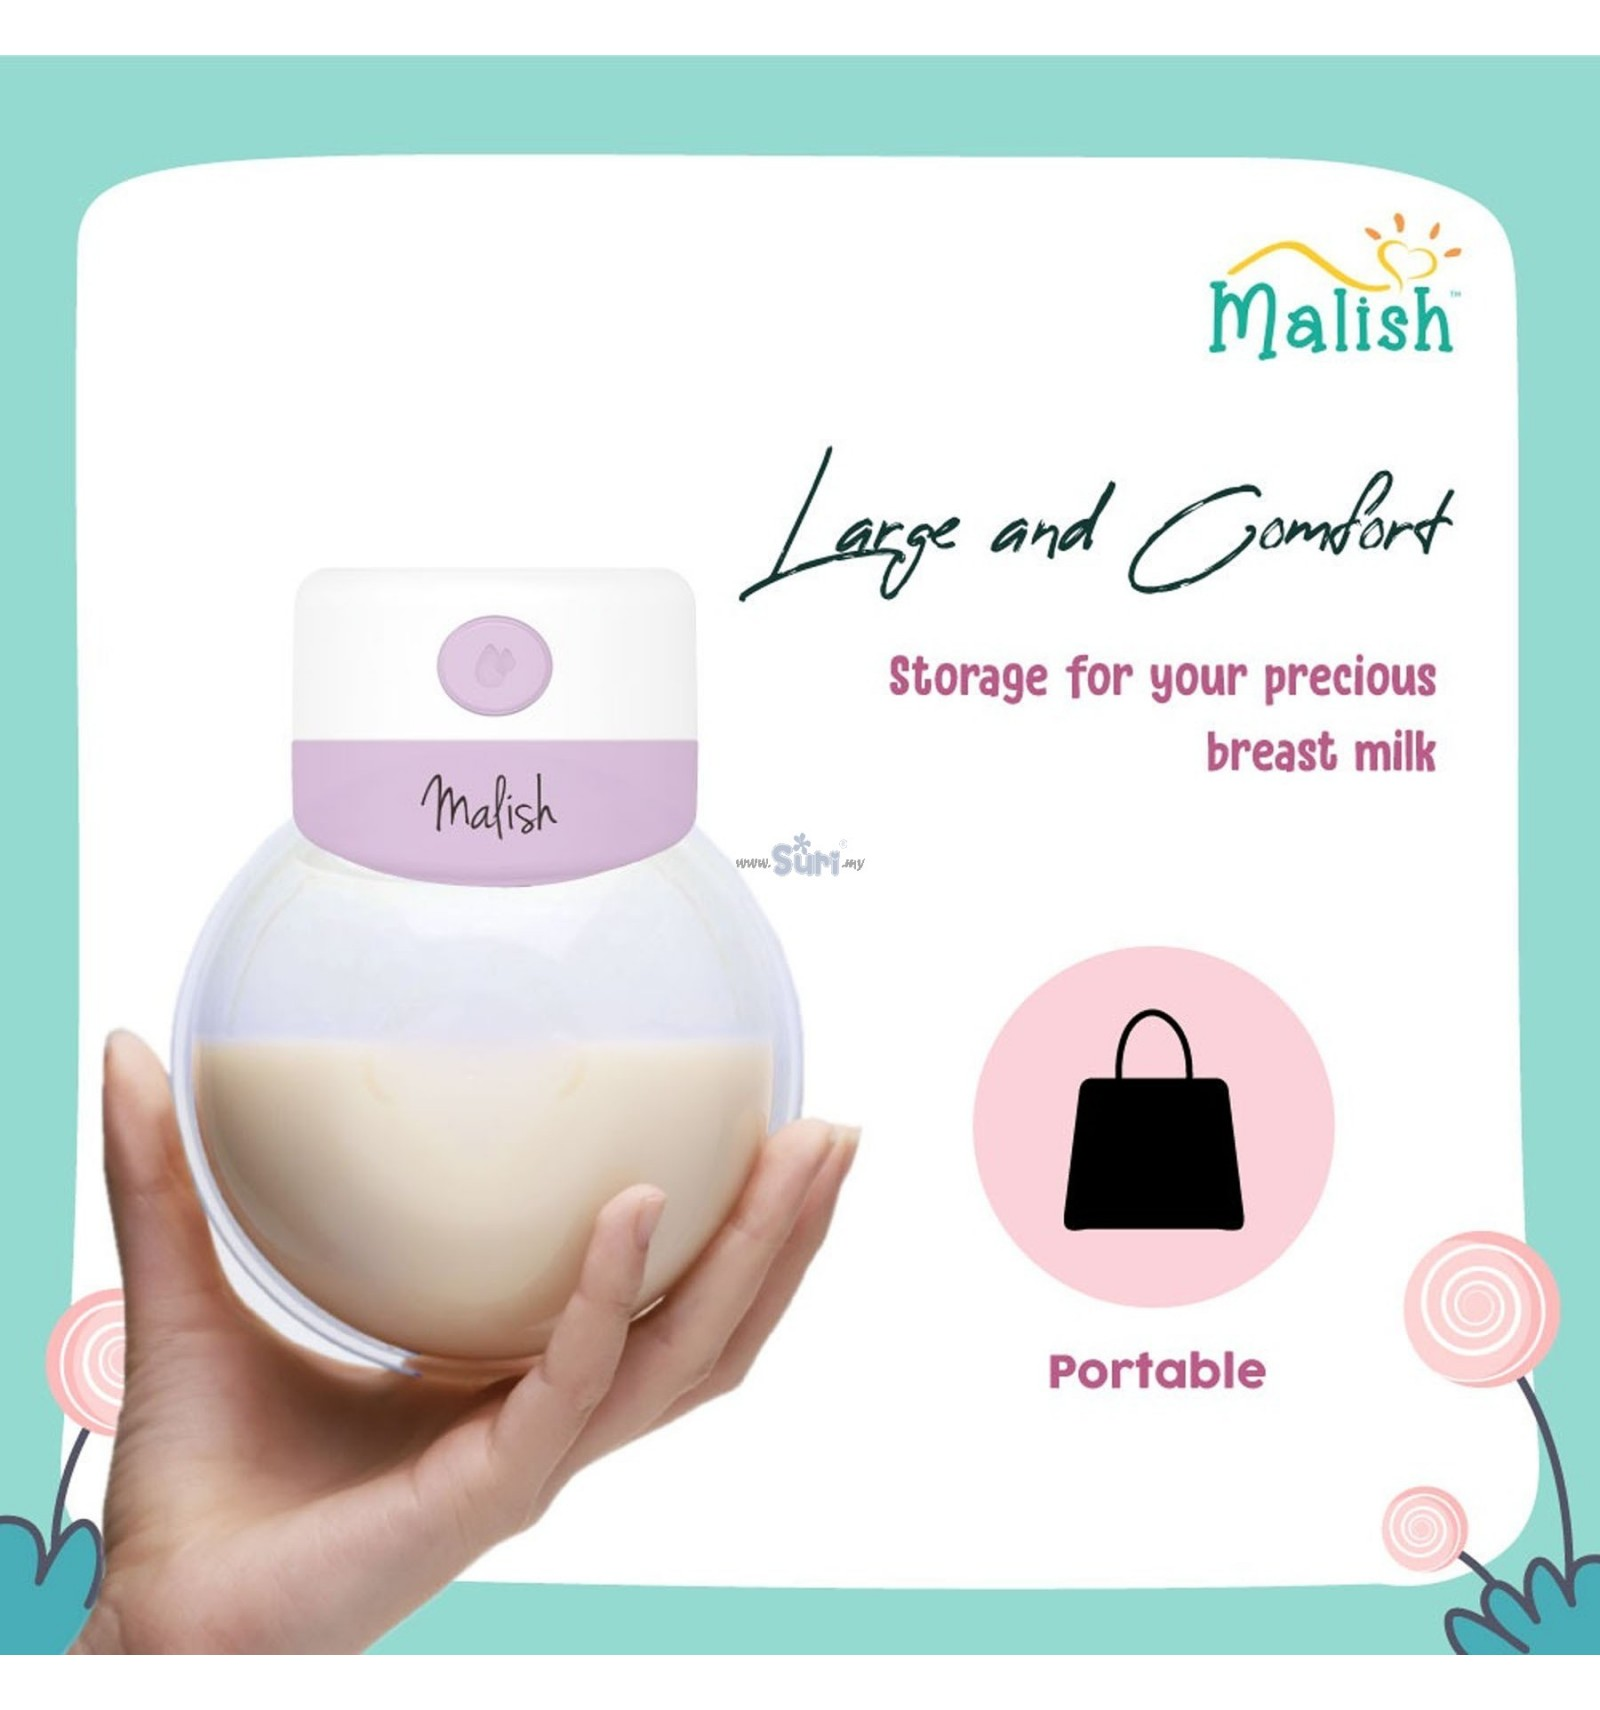 malish-luna-wearable-rechargeable-breast